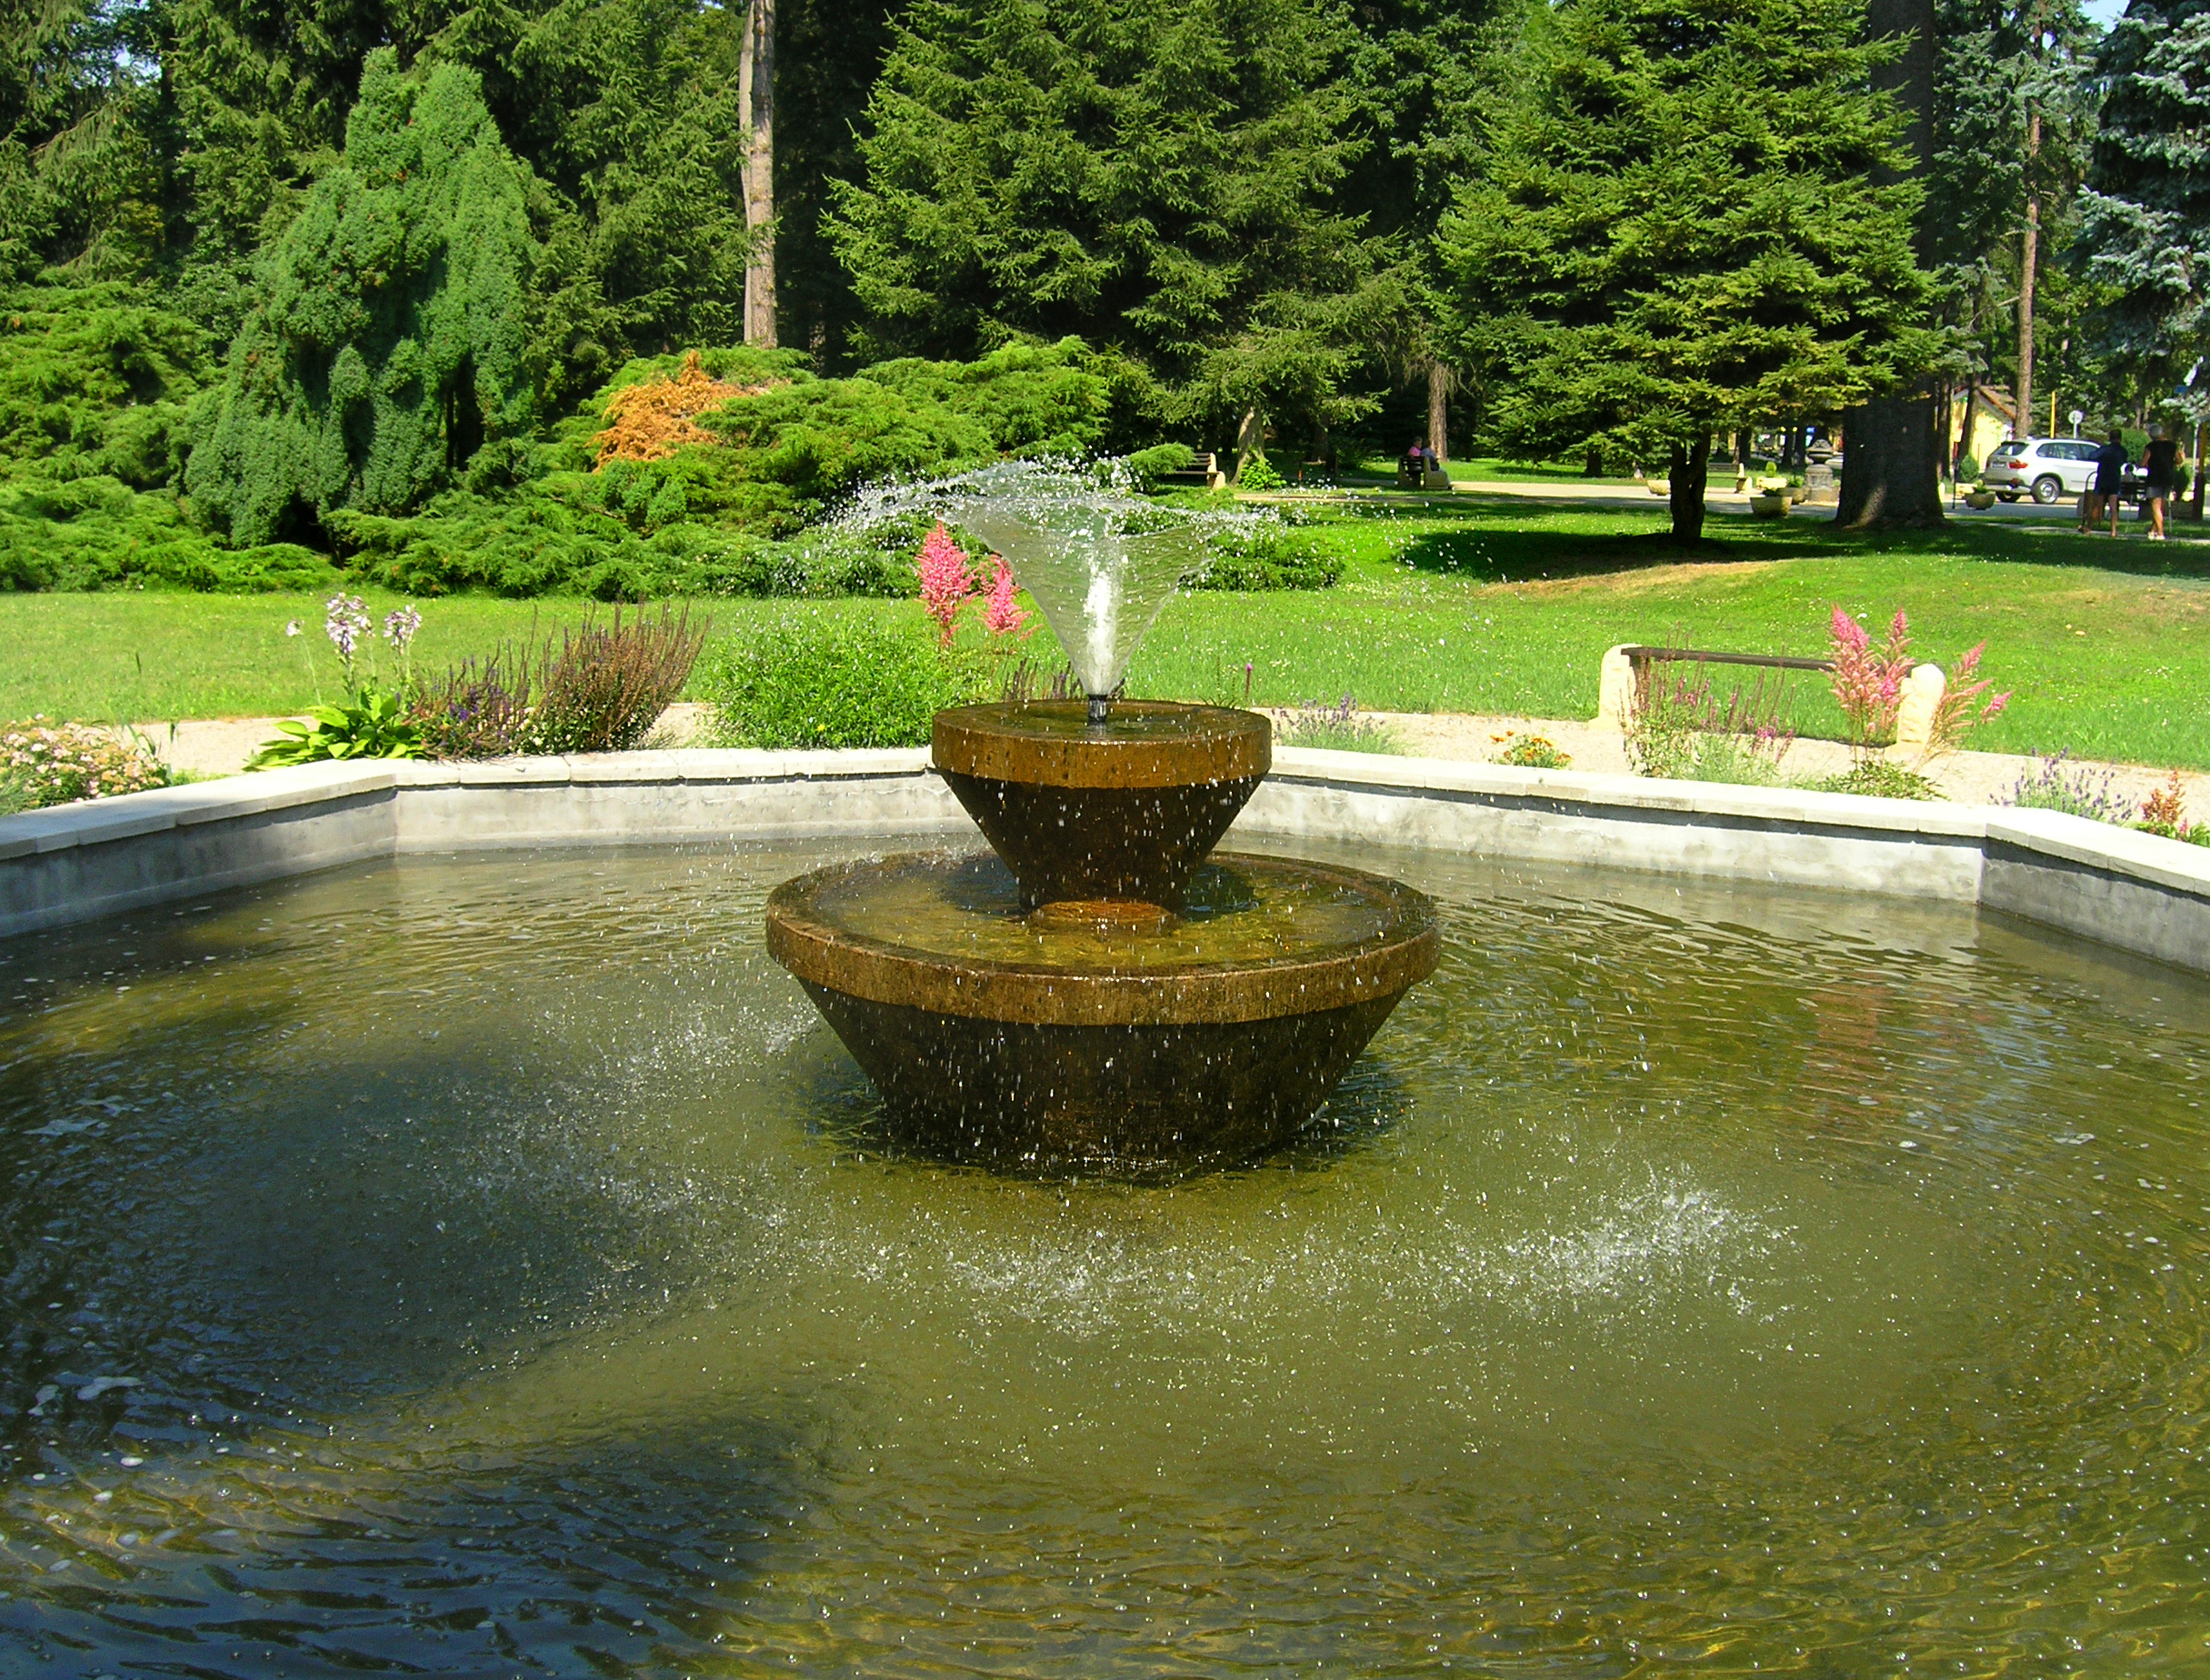 Fountain View Spa Nj